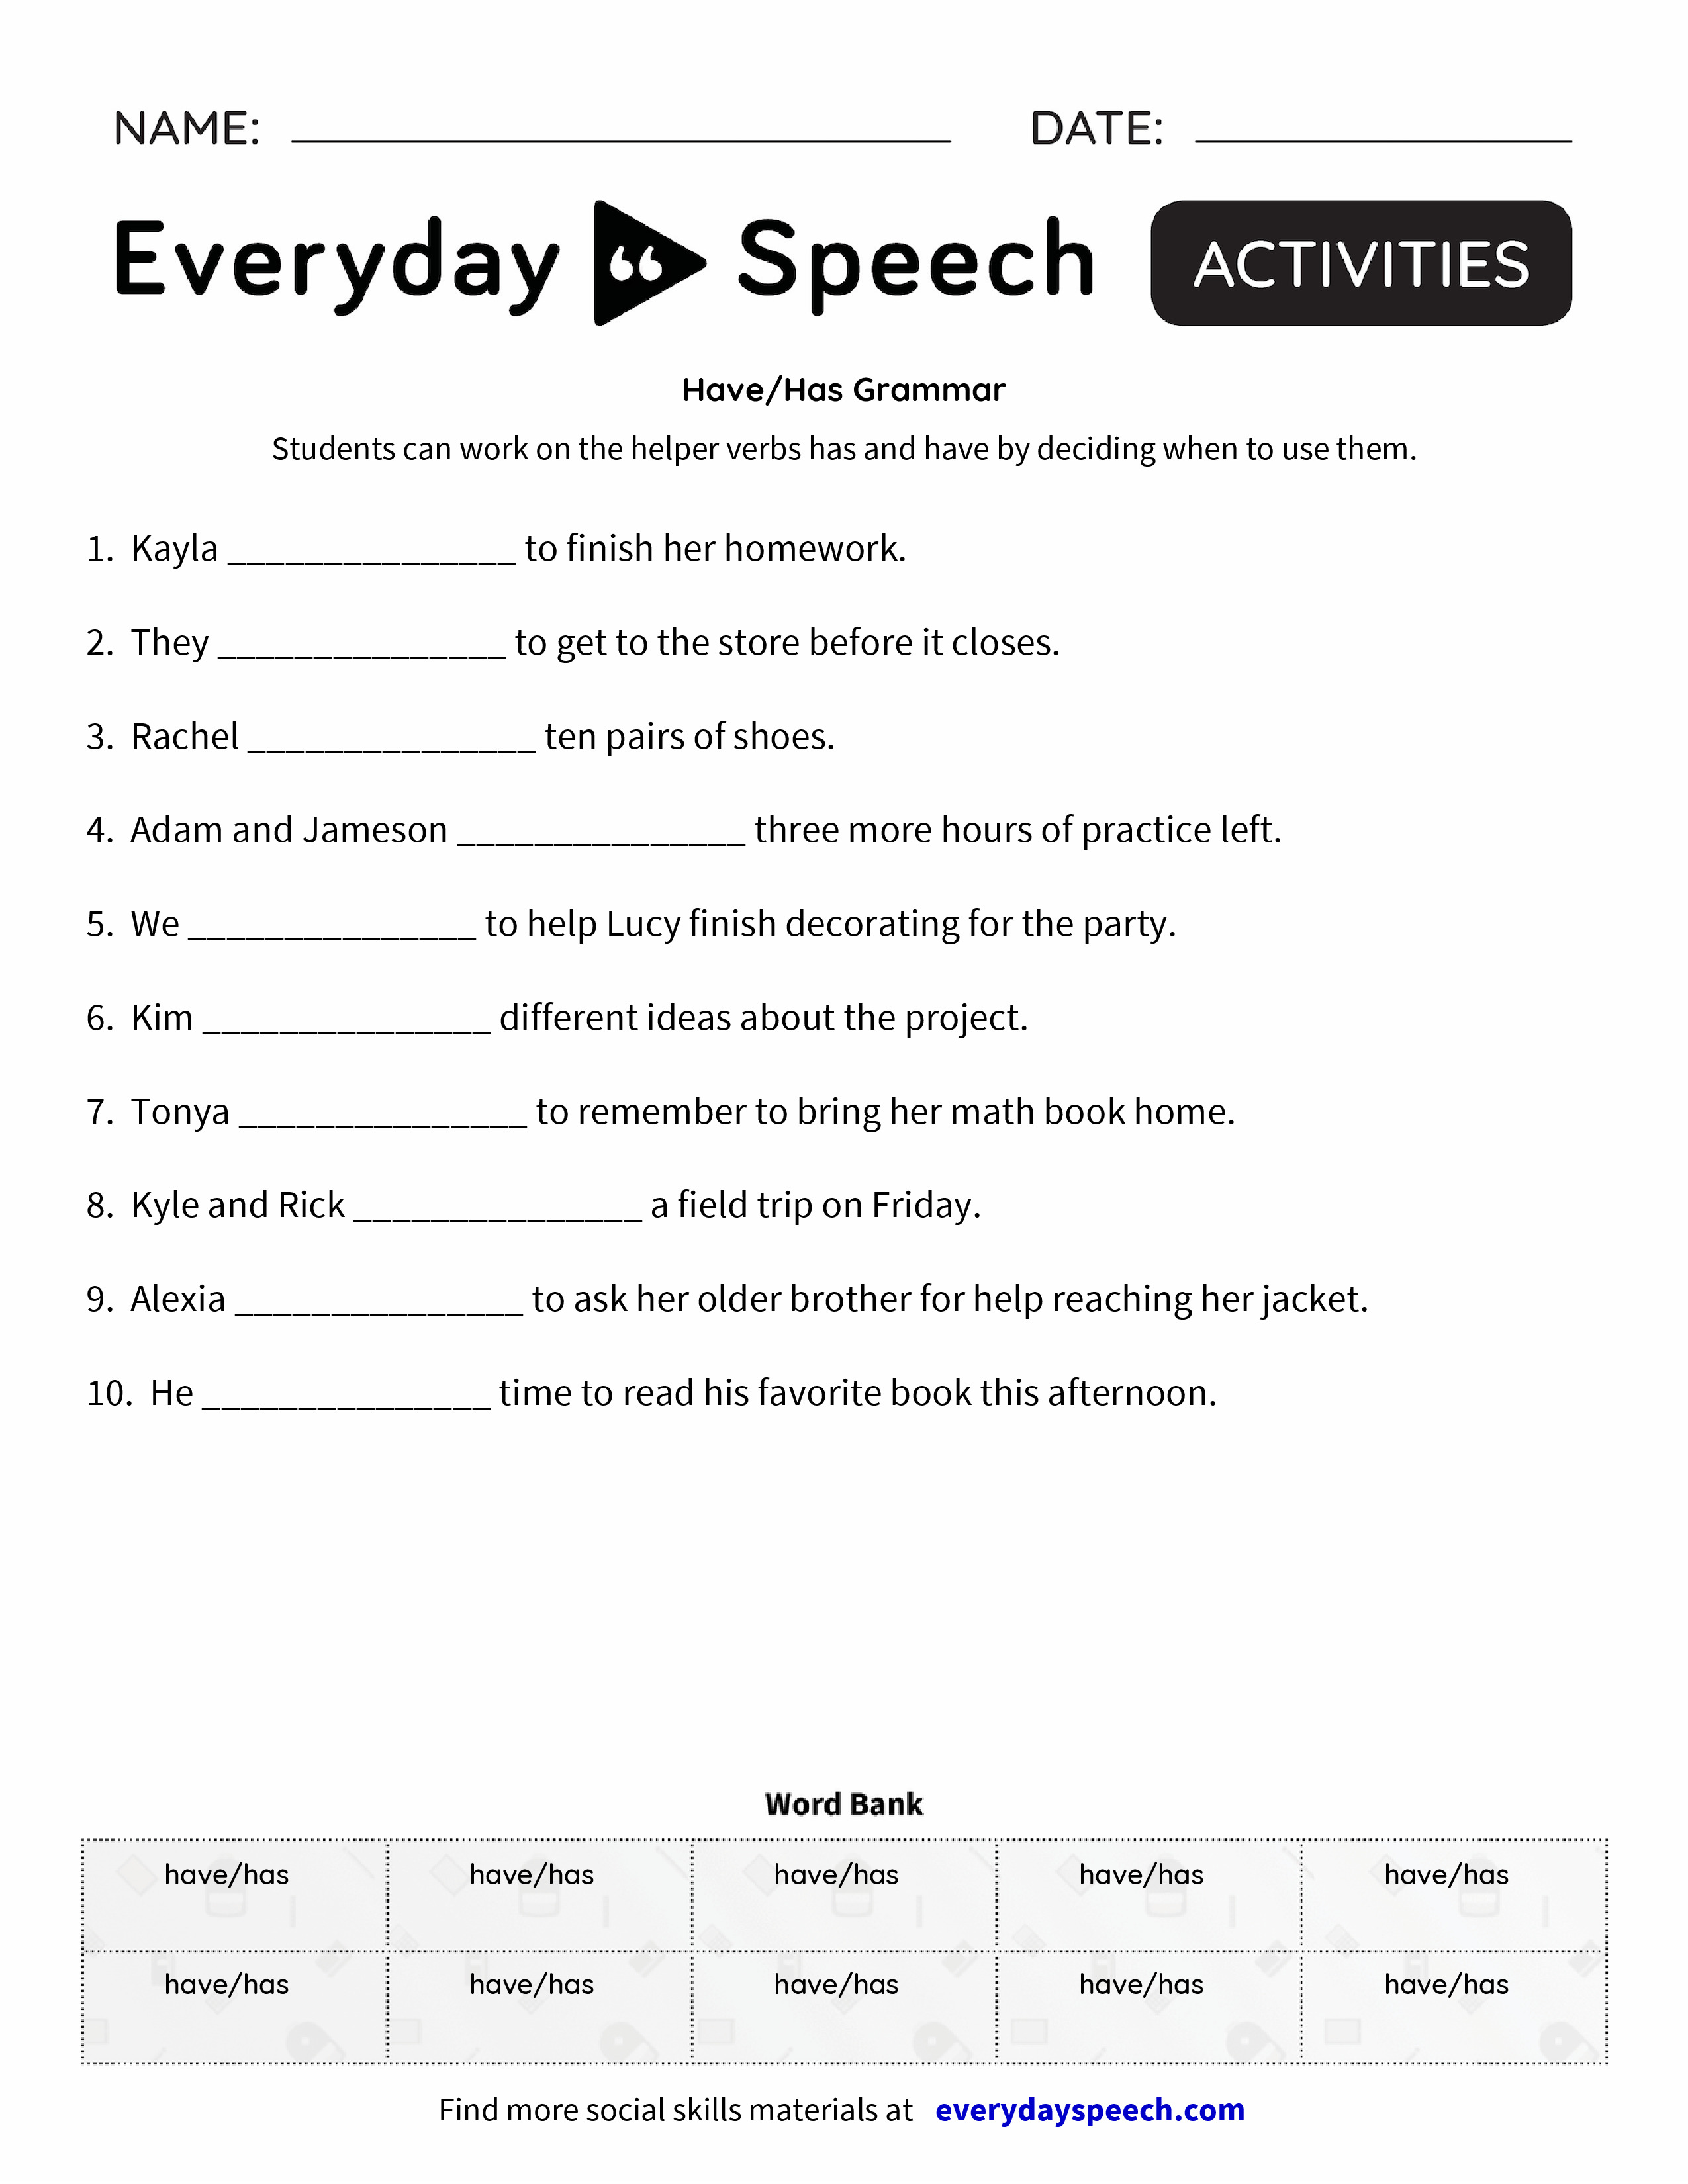 have has grammar everyday speech everyday speech. Black Bedroom Furniture Sets. Home Design Ideas